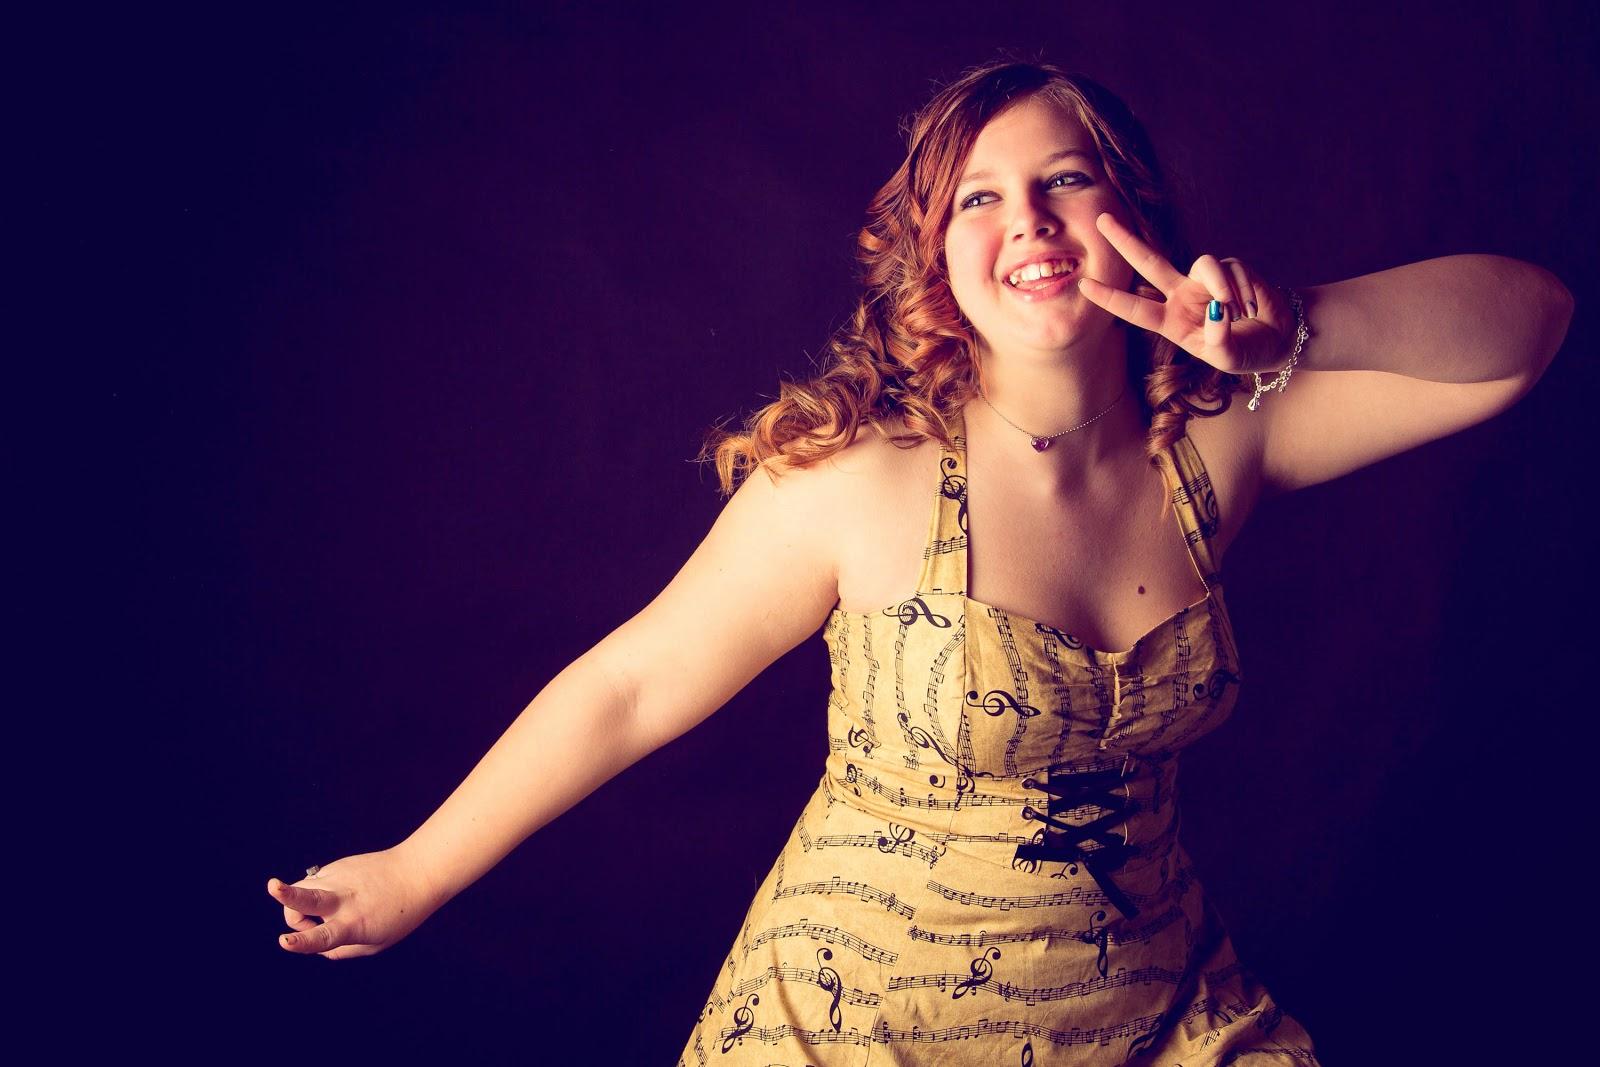 Kathryn 3 - photo by Jonathan Frings - Deborah's Gems